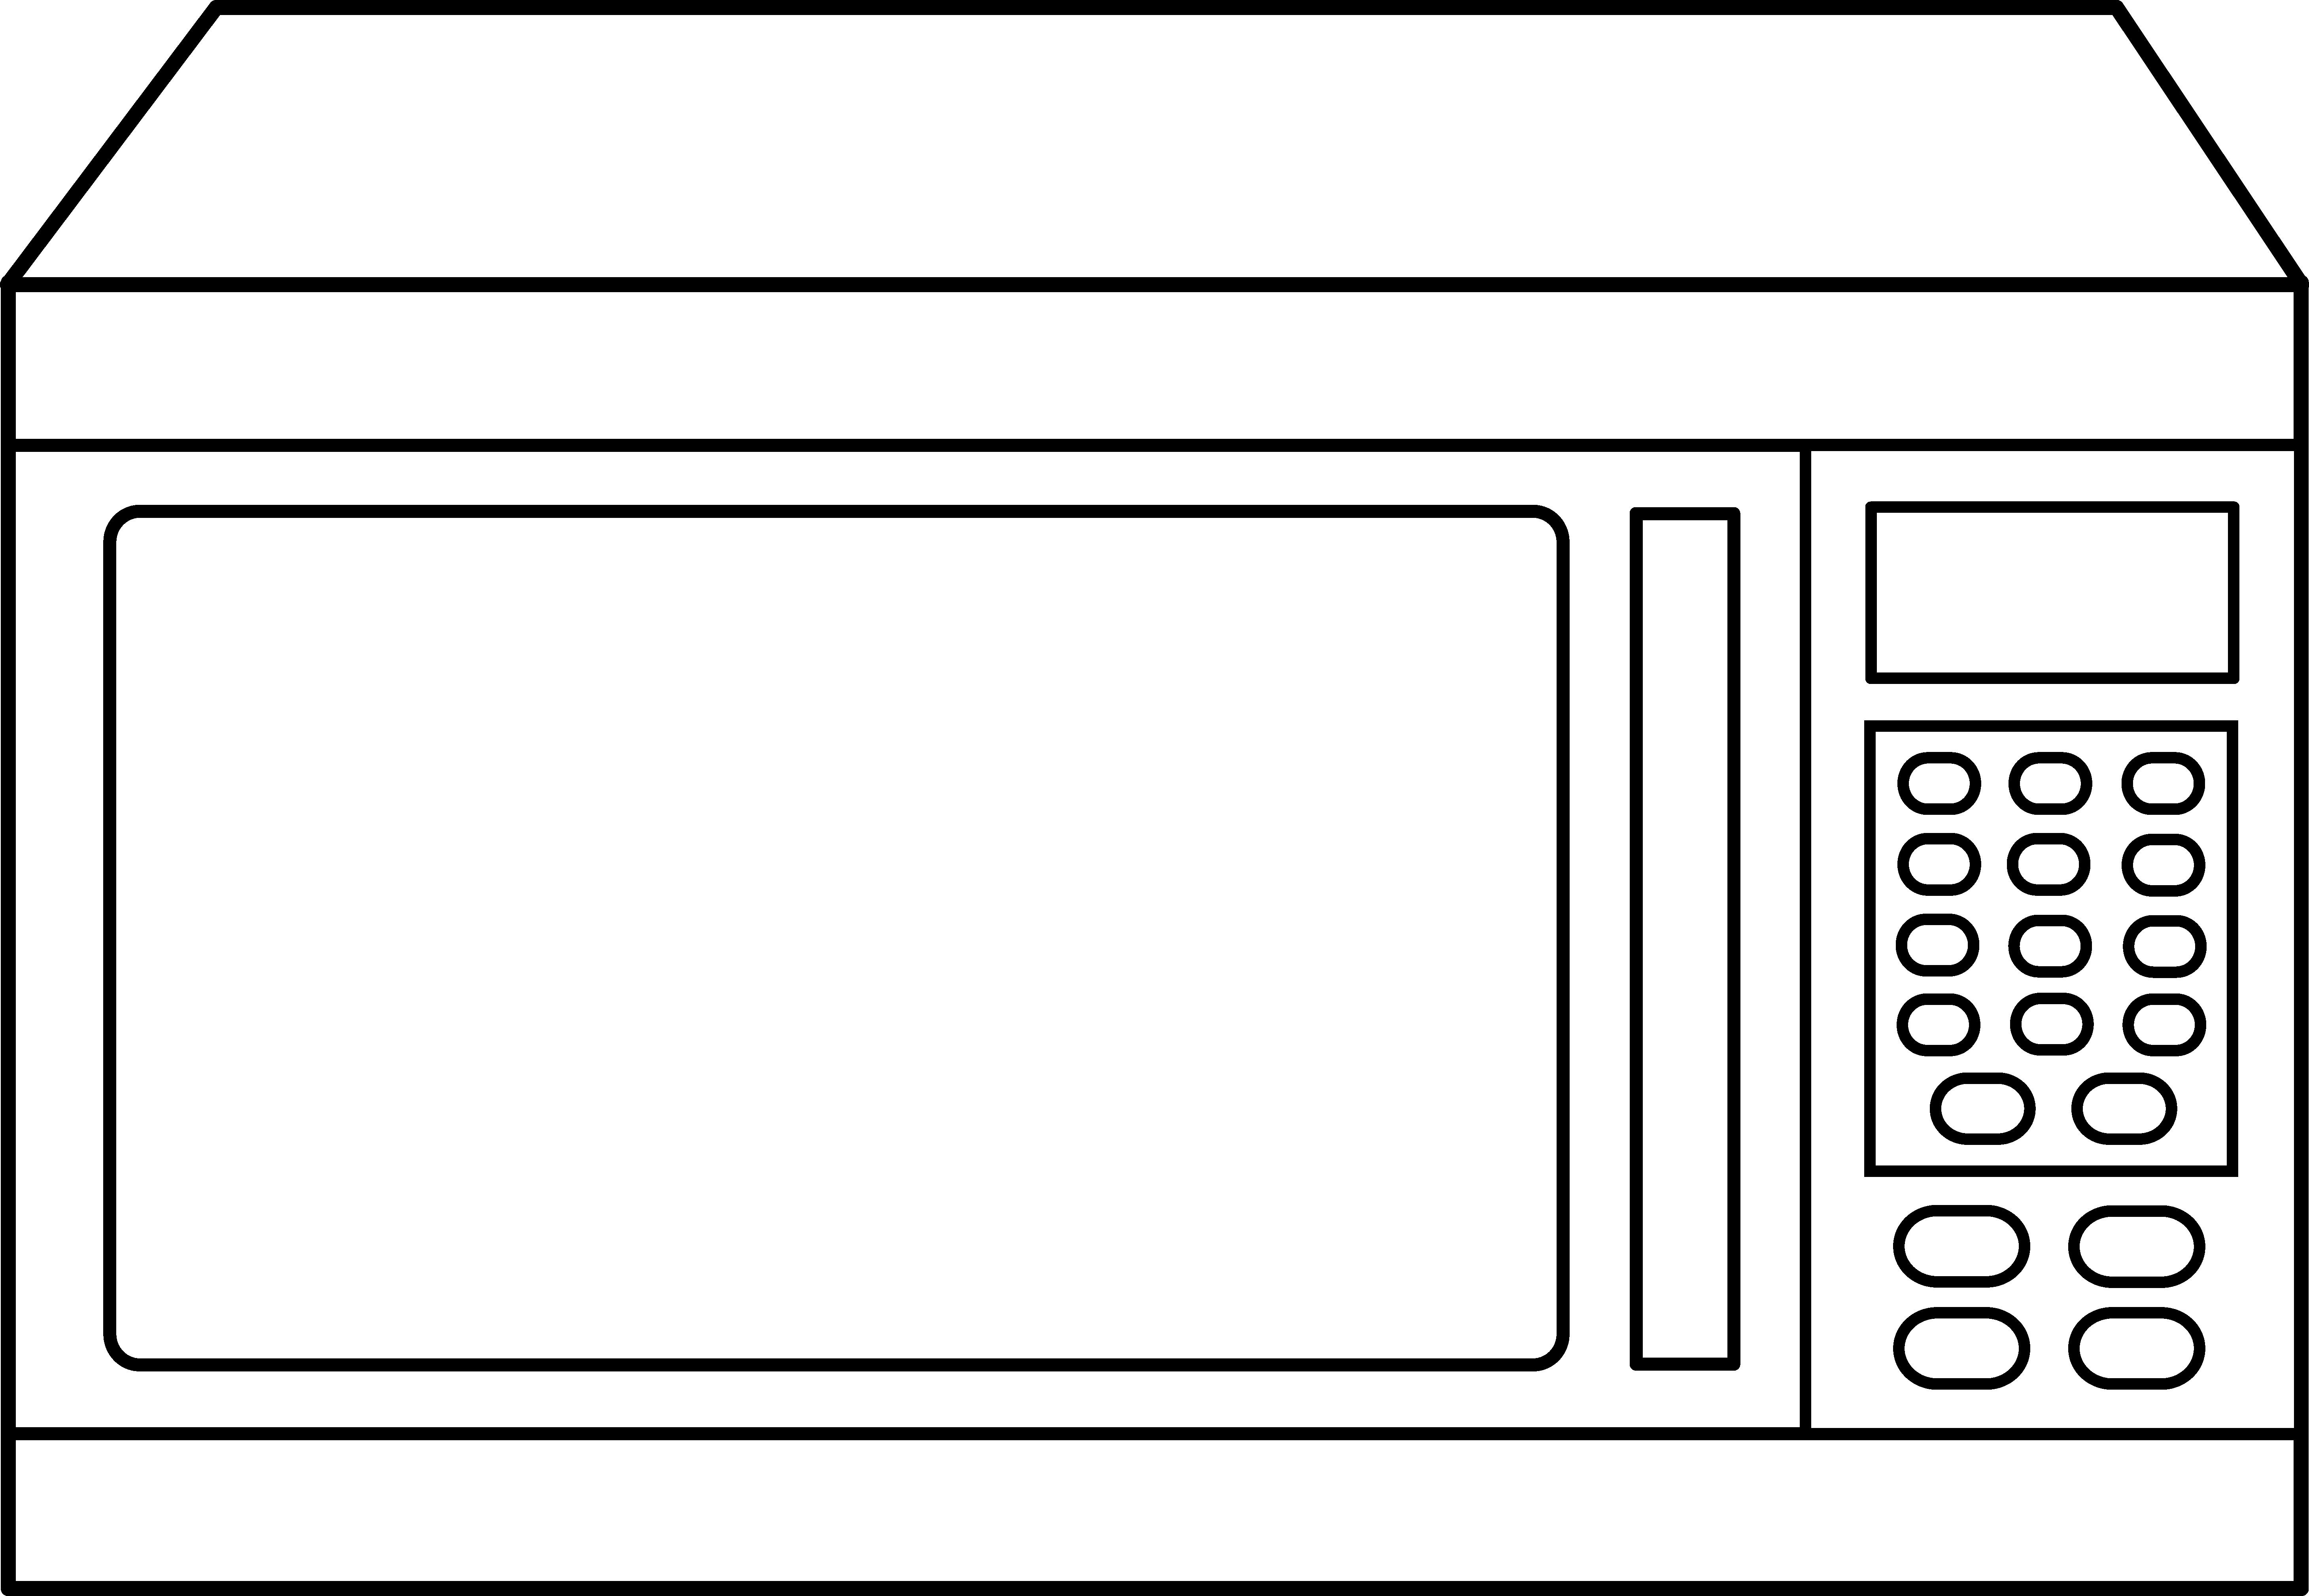 Microwave Oven Line Art.